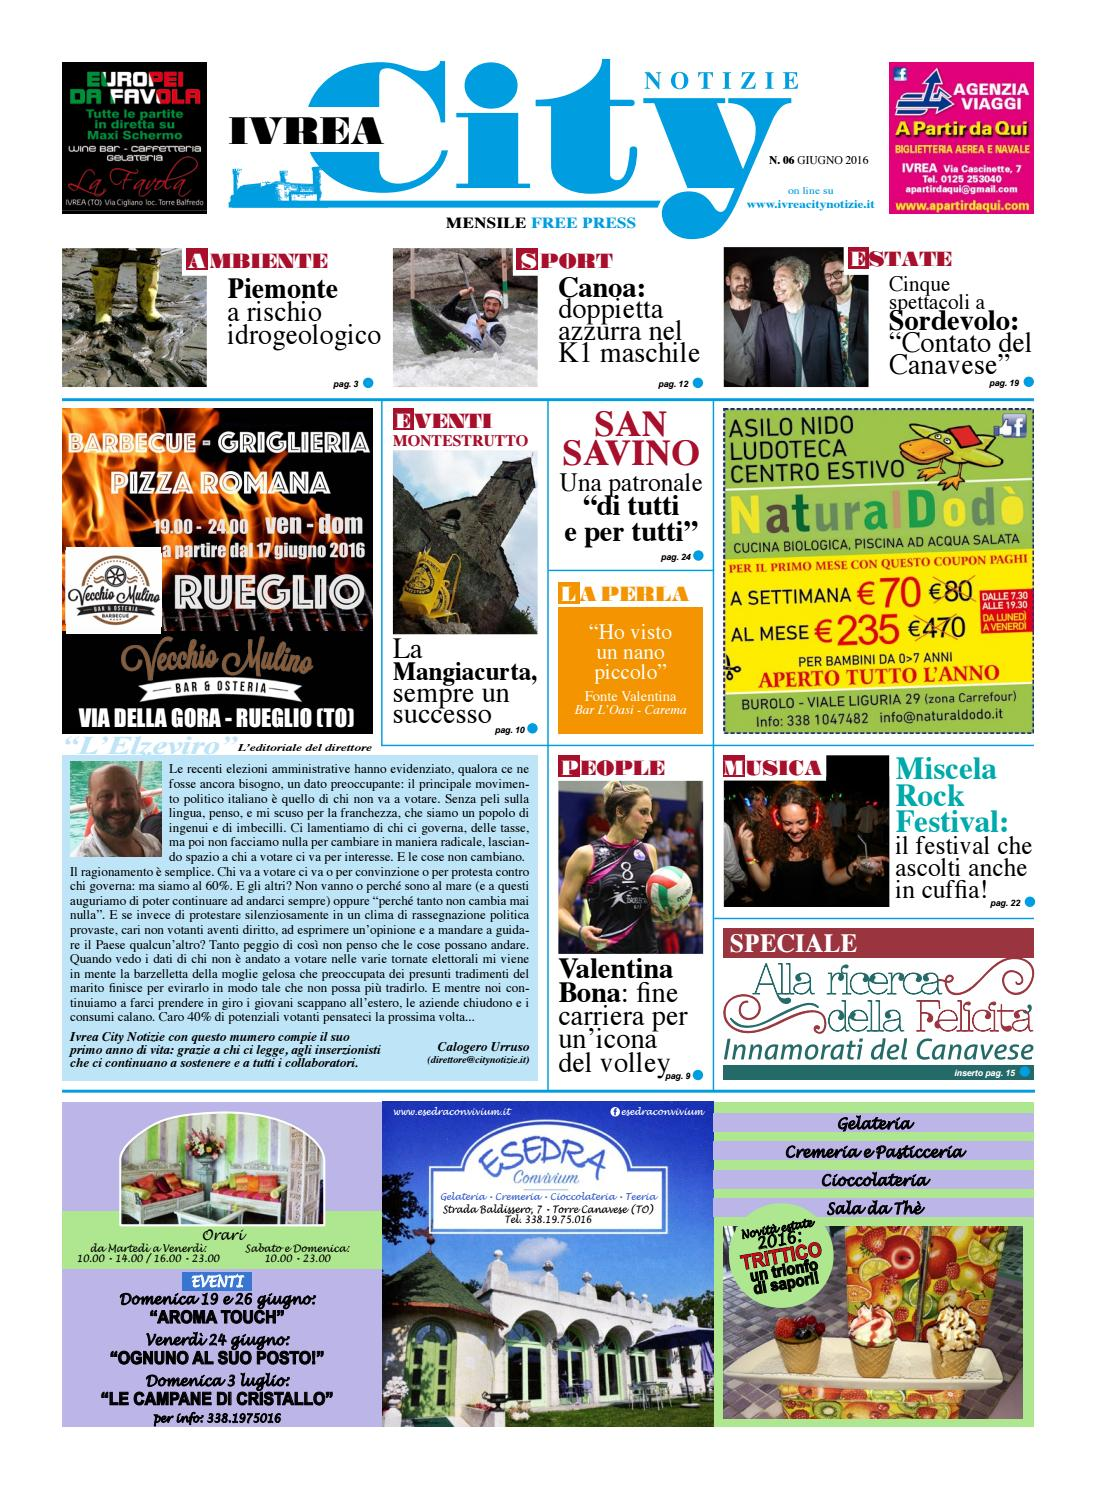 06349644fb IVREA CITY NOTIZIE 06 2016 by Calogero Urruso - issuu